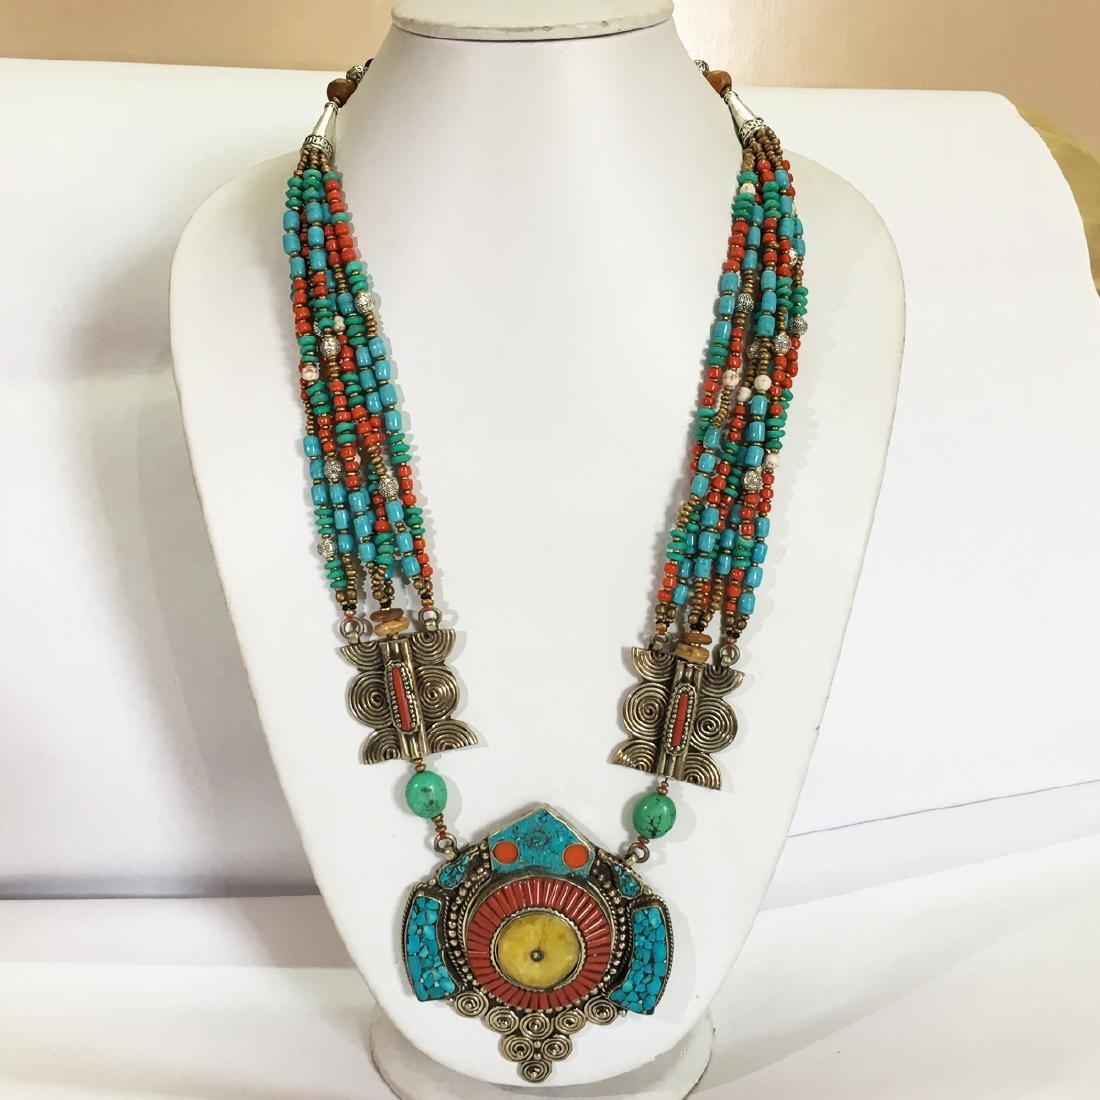 Tibetan Buddhist Turquoise & Amber Vintage Necklace